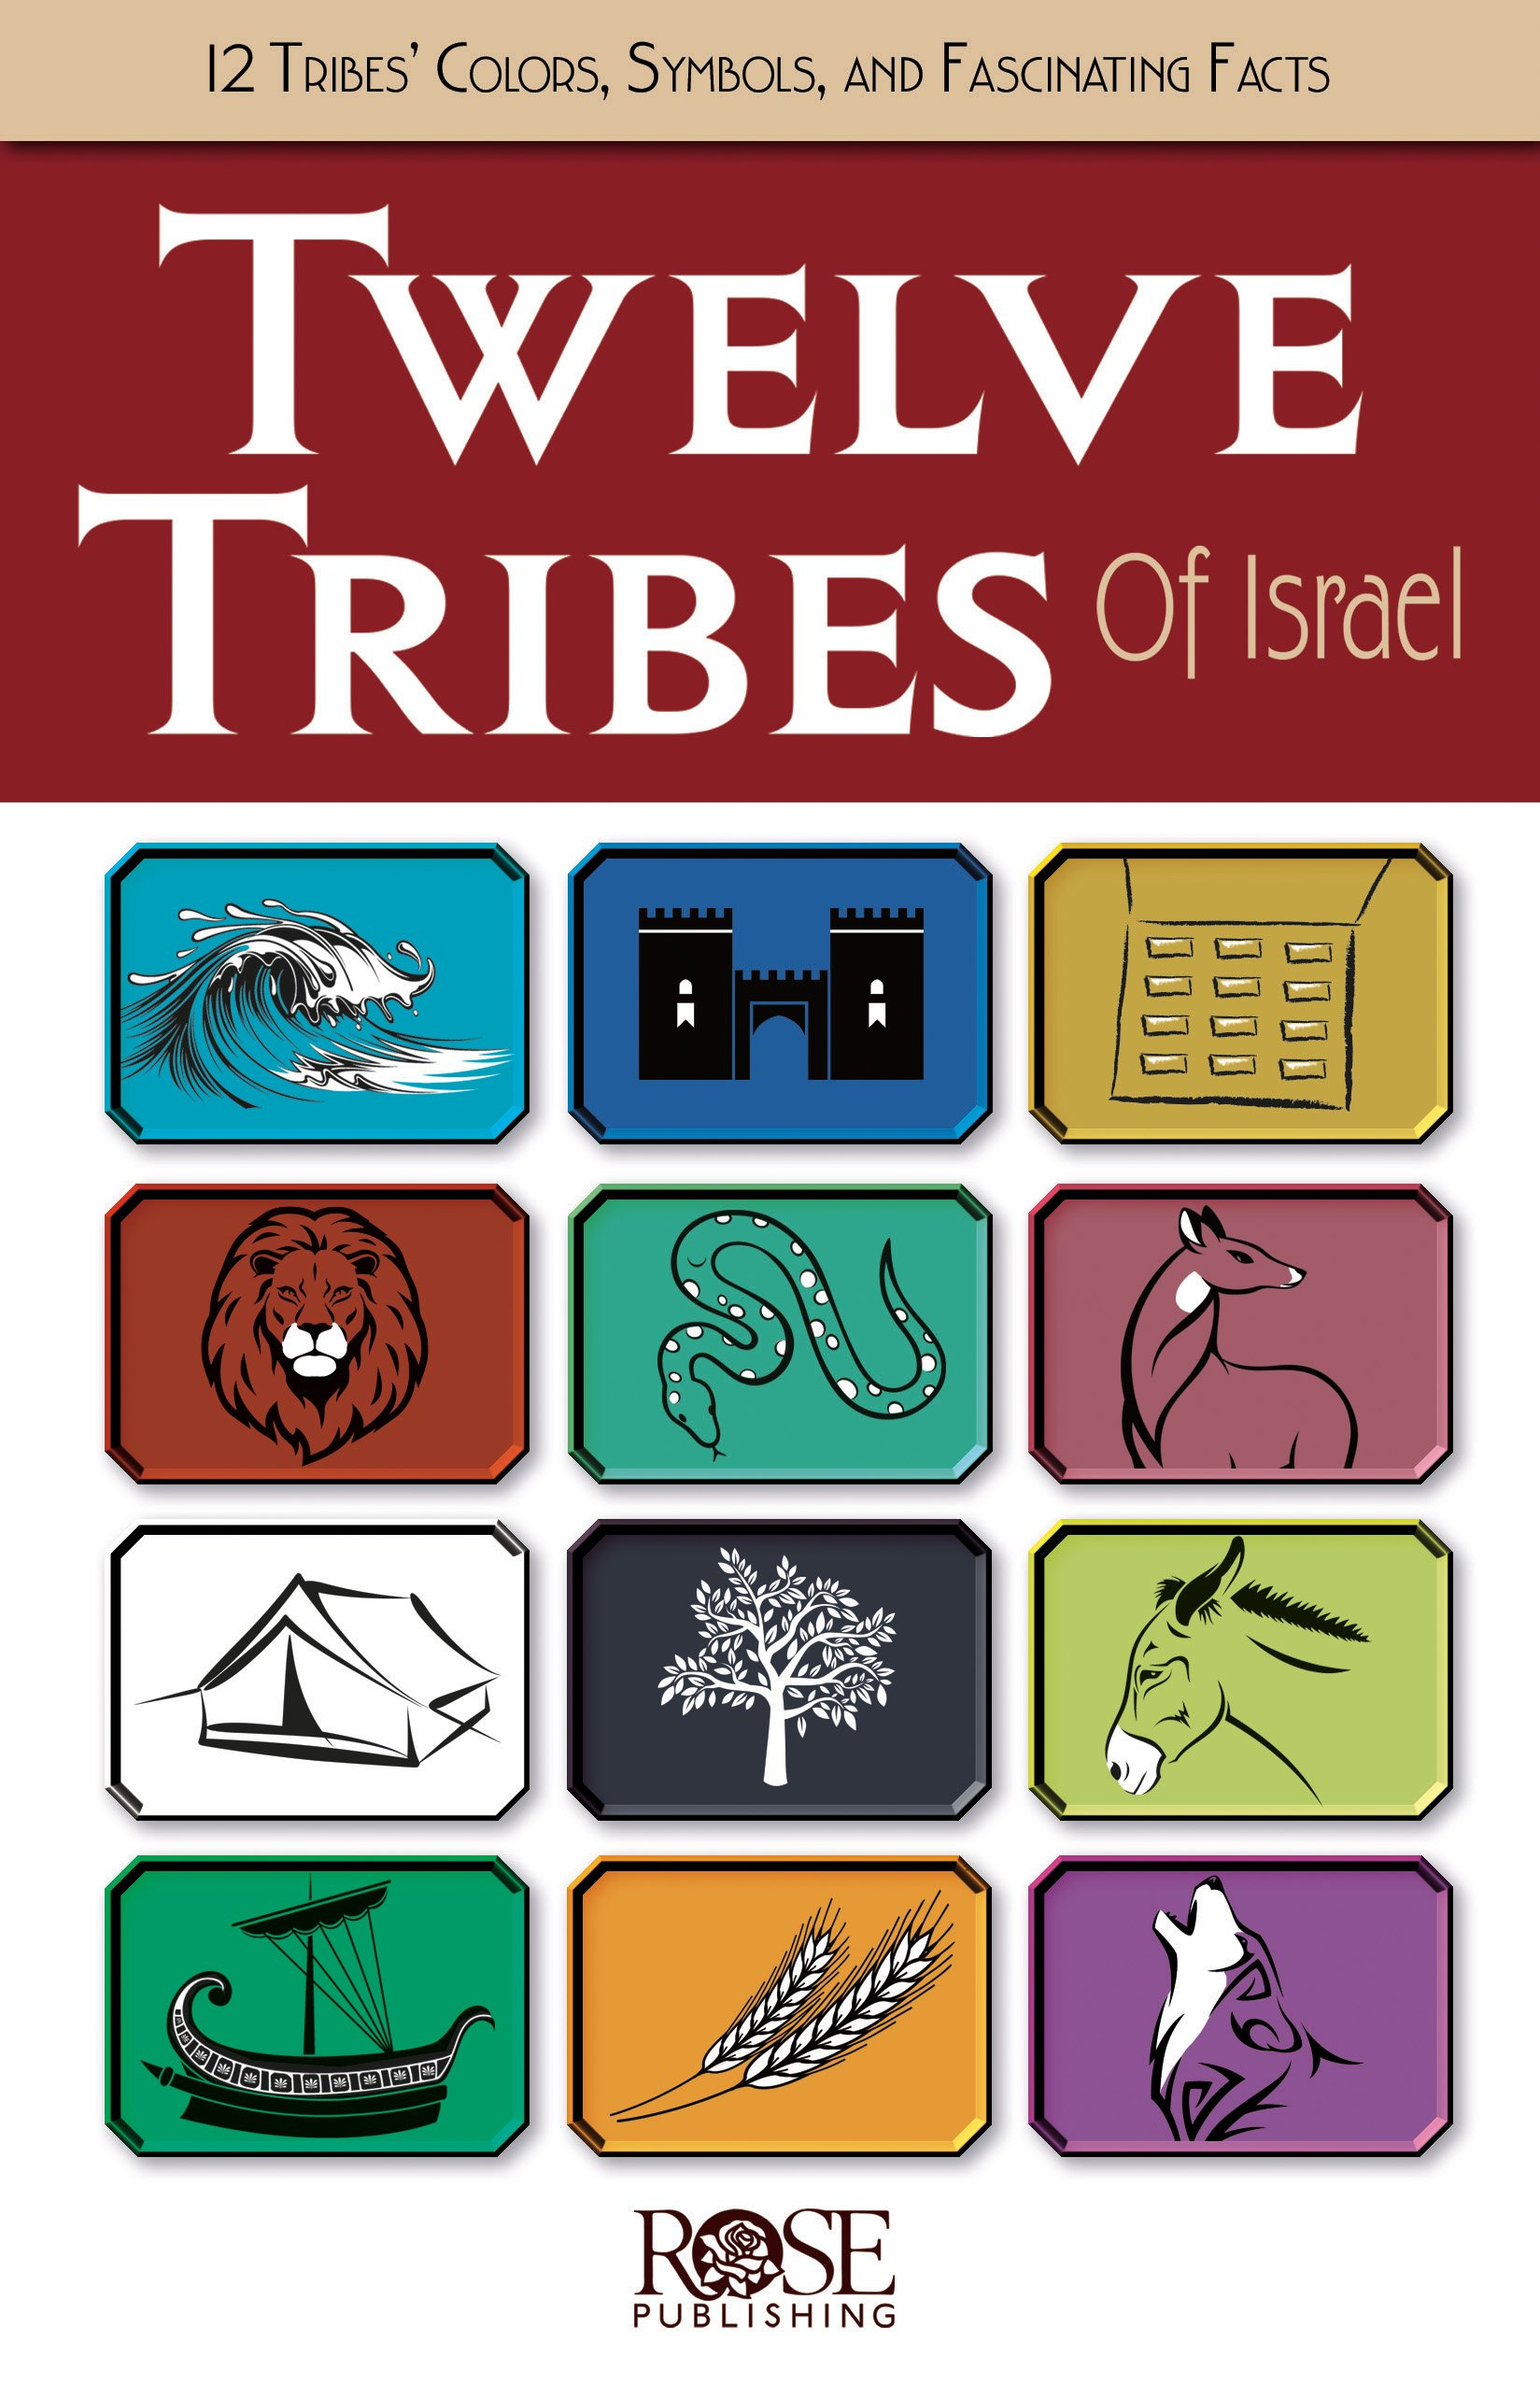 Twelve tribes of israel jessica curiel rose publishing twelve tribes of israel jessica curiel rose publishing 9781596369160 amazon books biocorpaavc Gallery